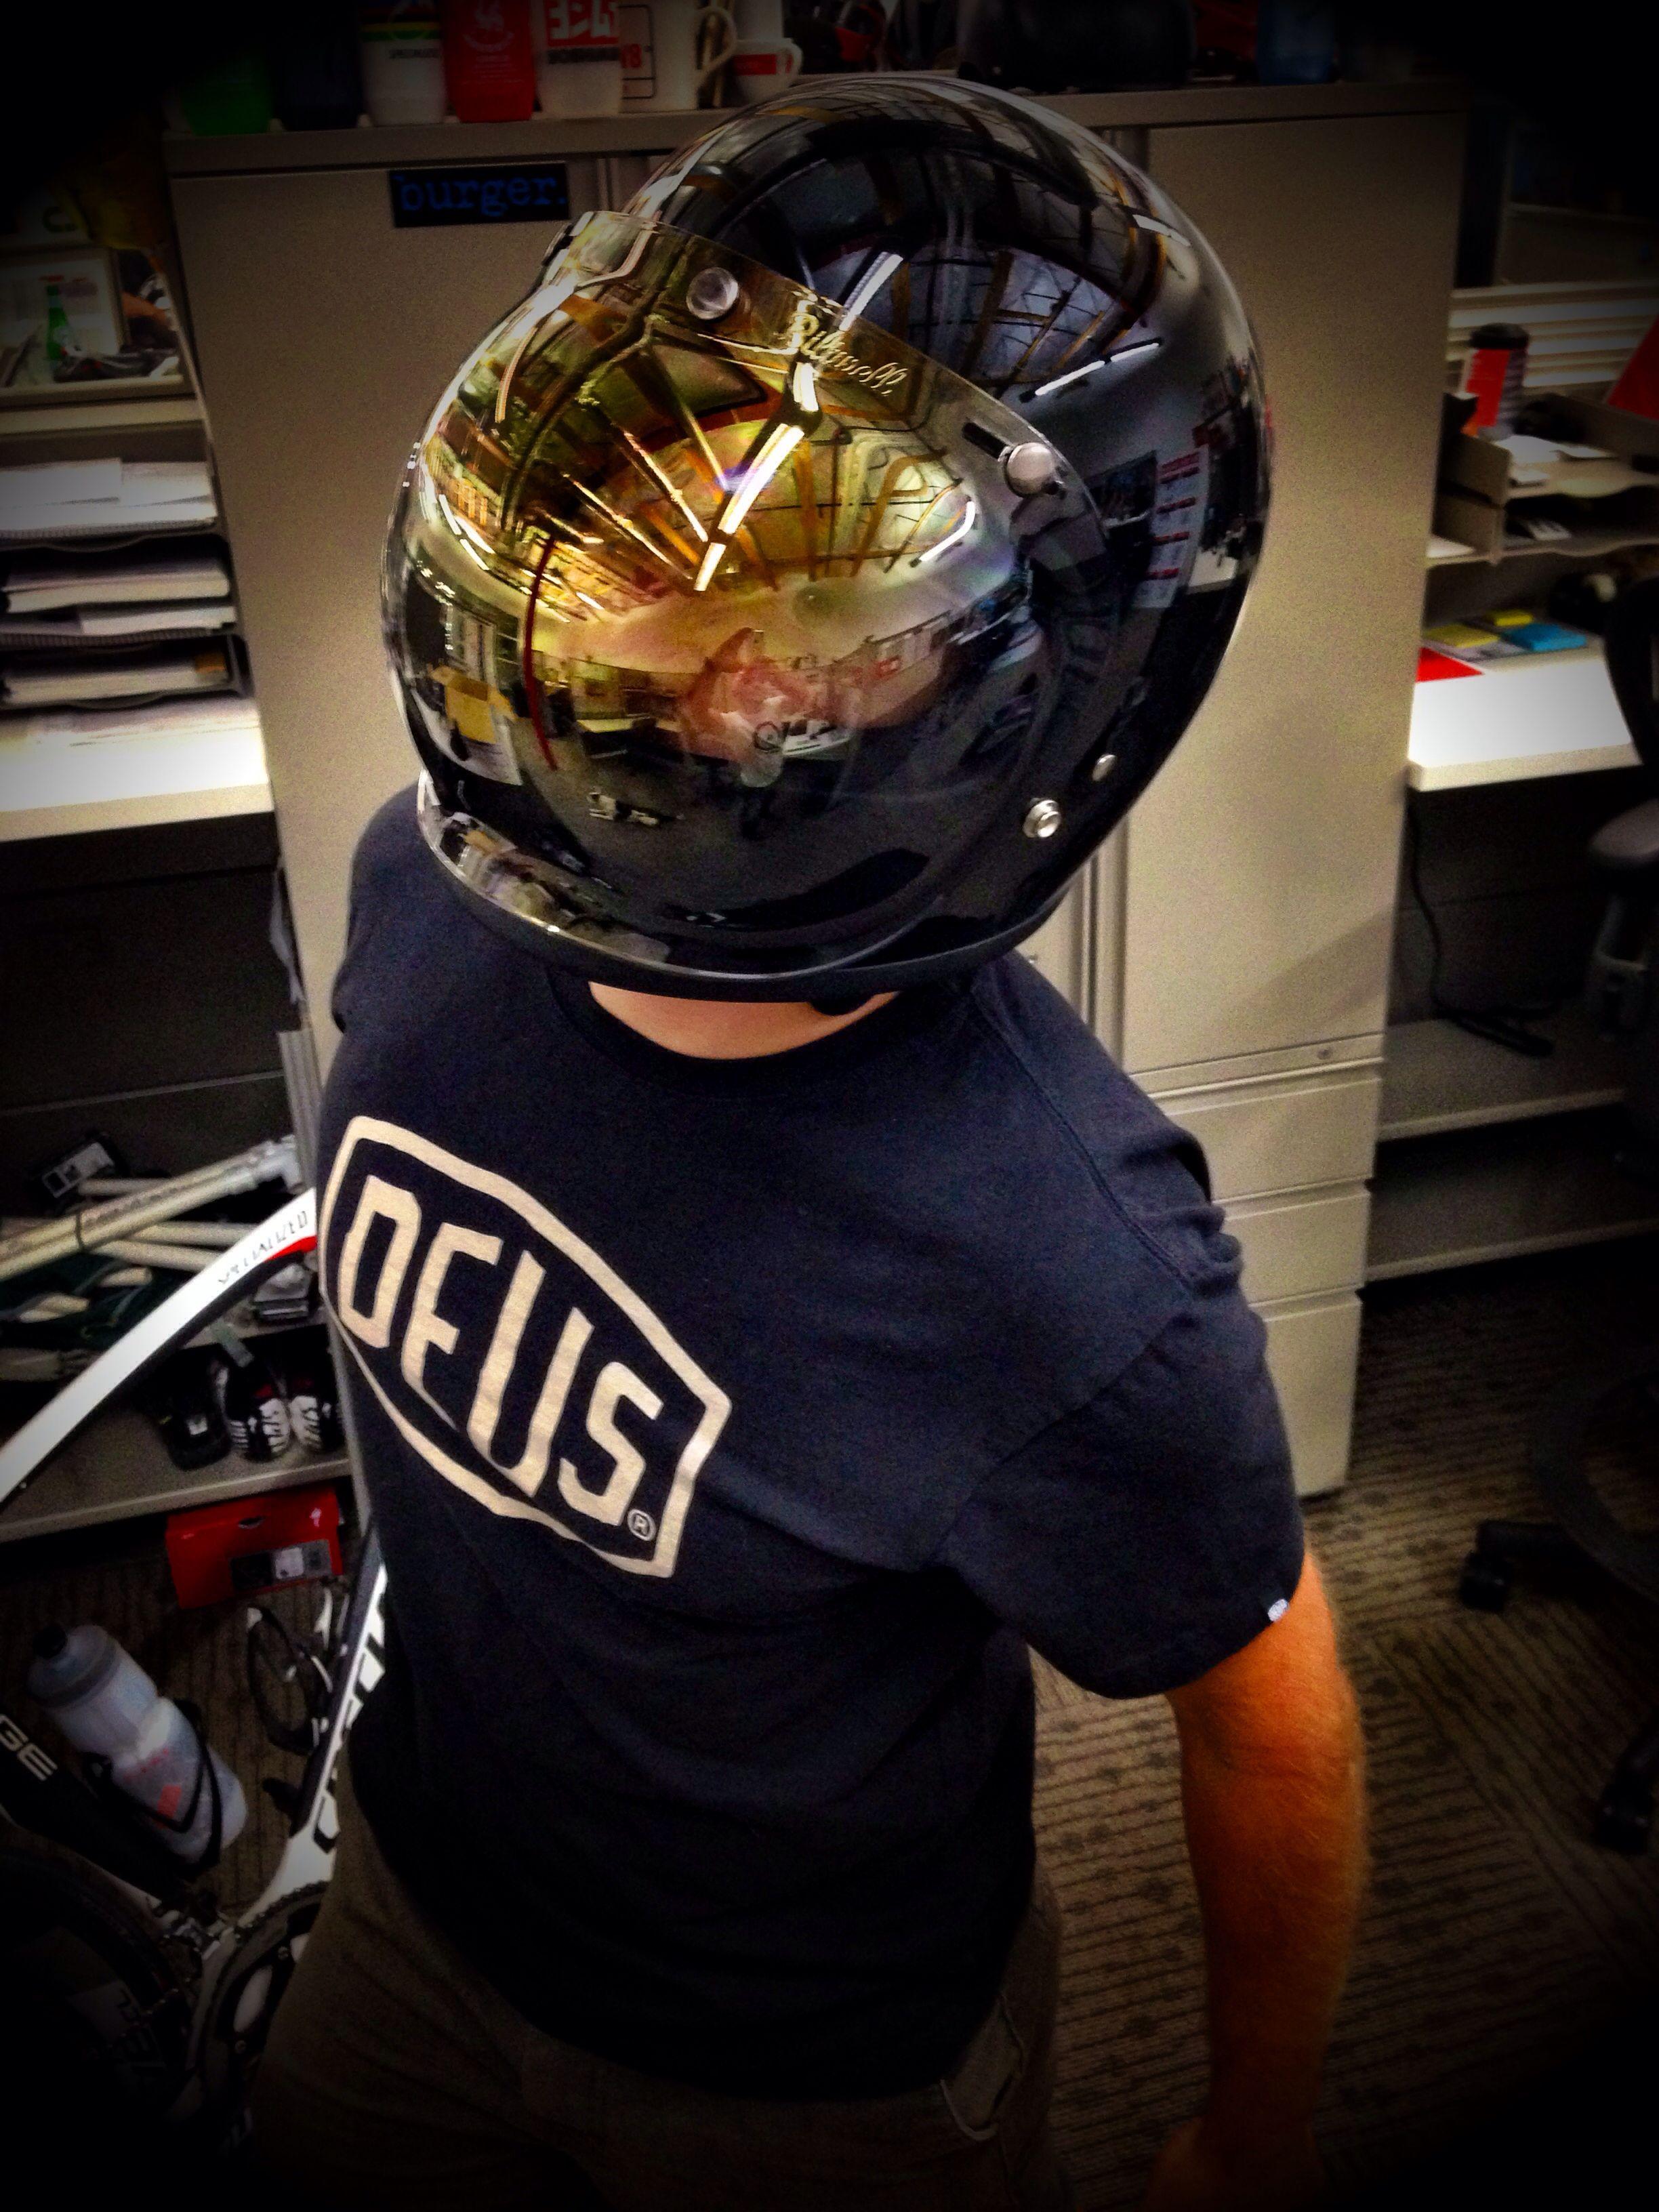 Wrenchmonkees Biltwell Gringo helmet and Biltwell Bubble Shield ...